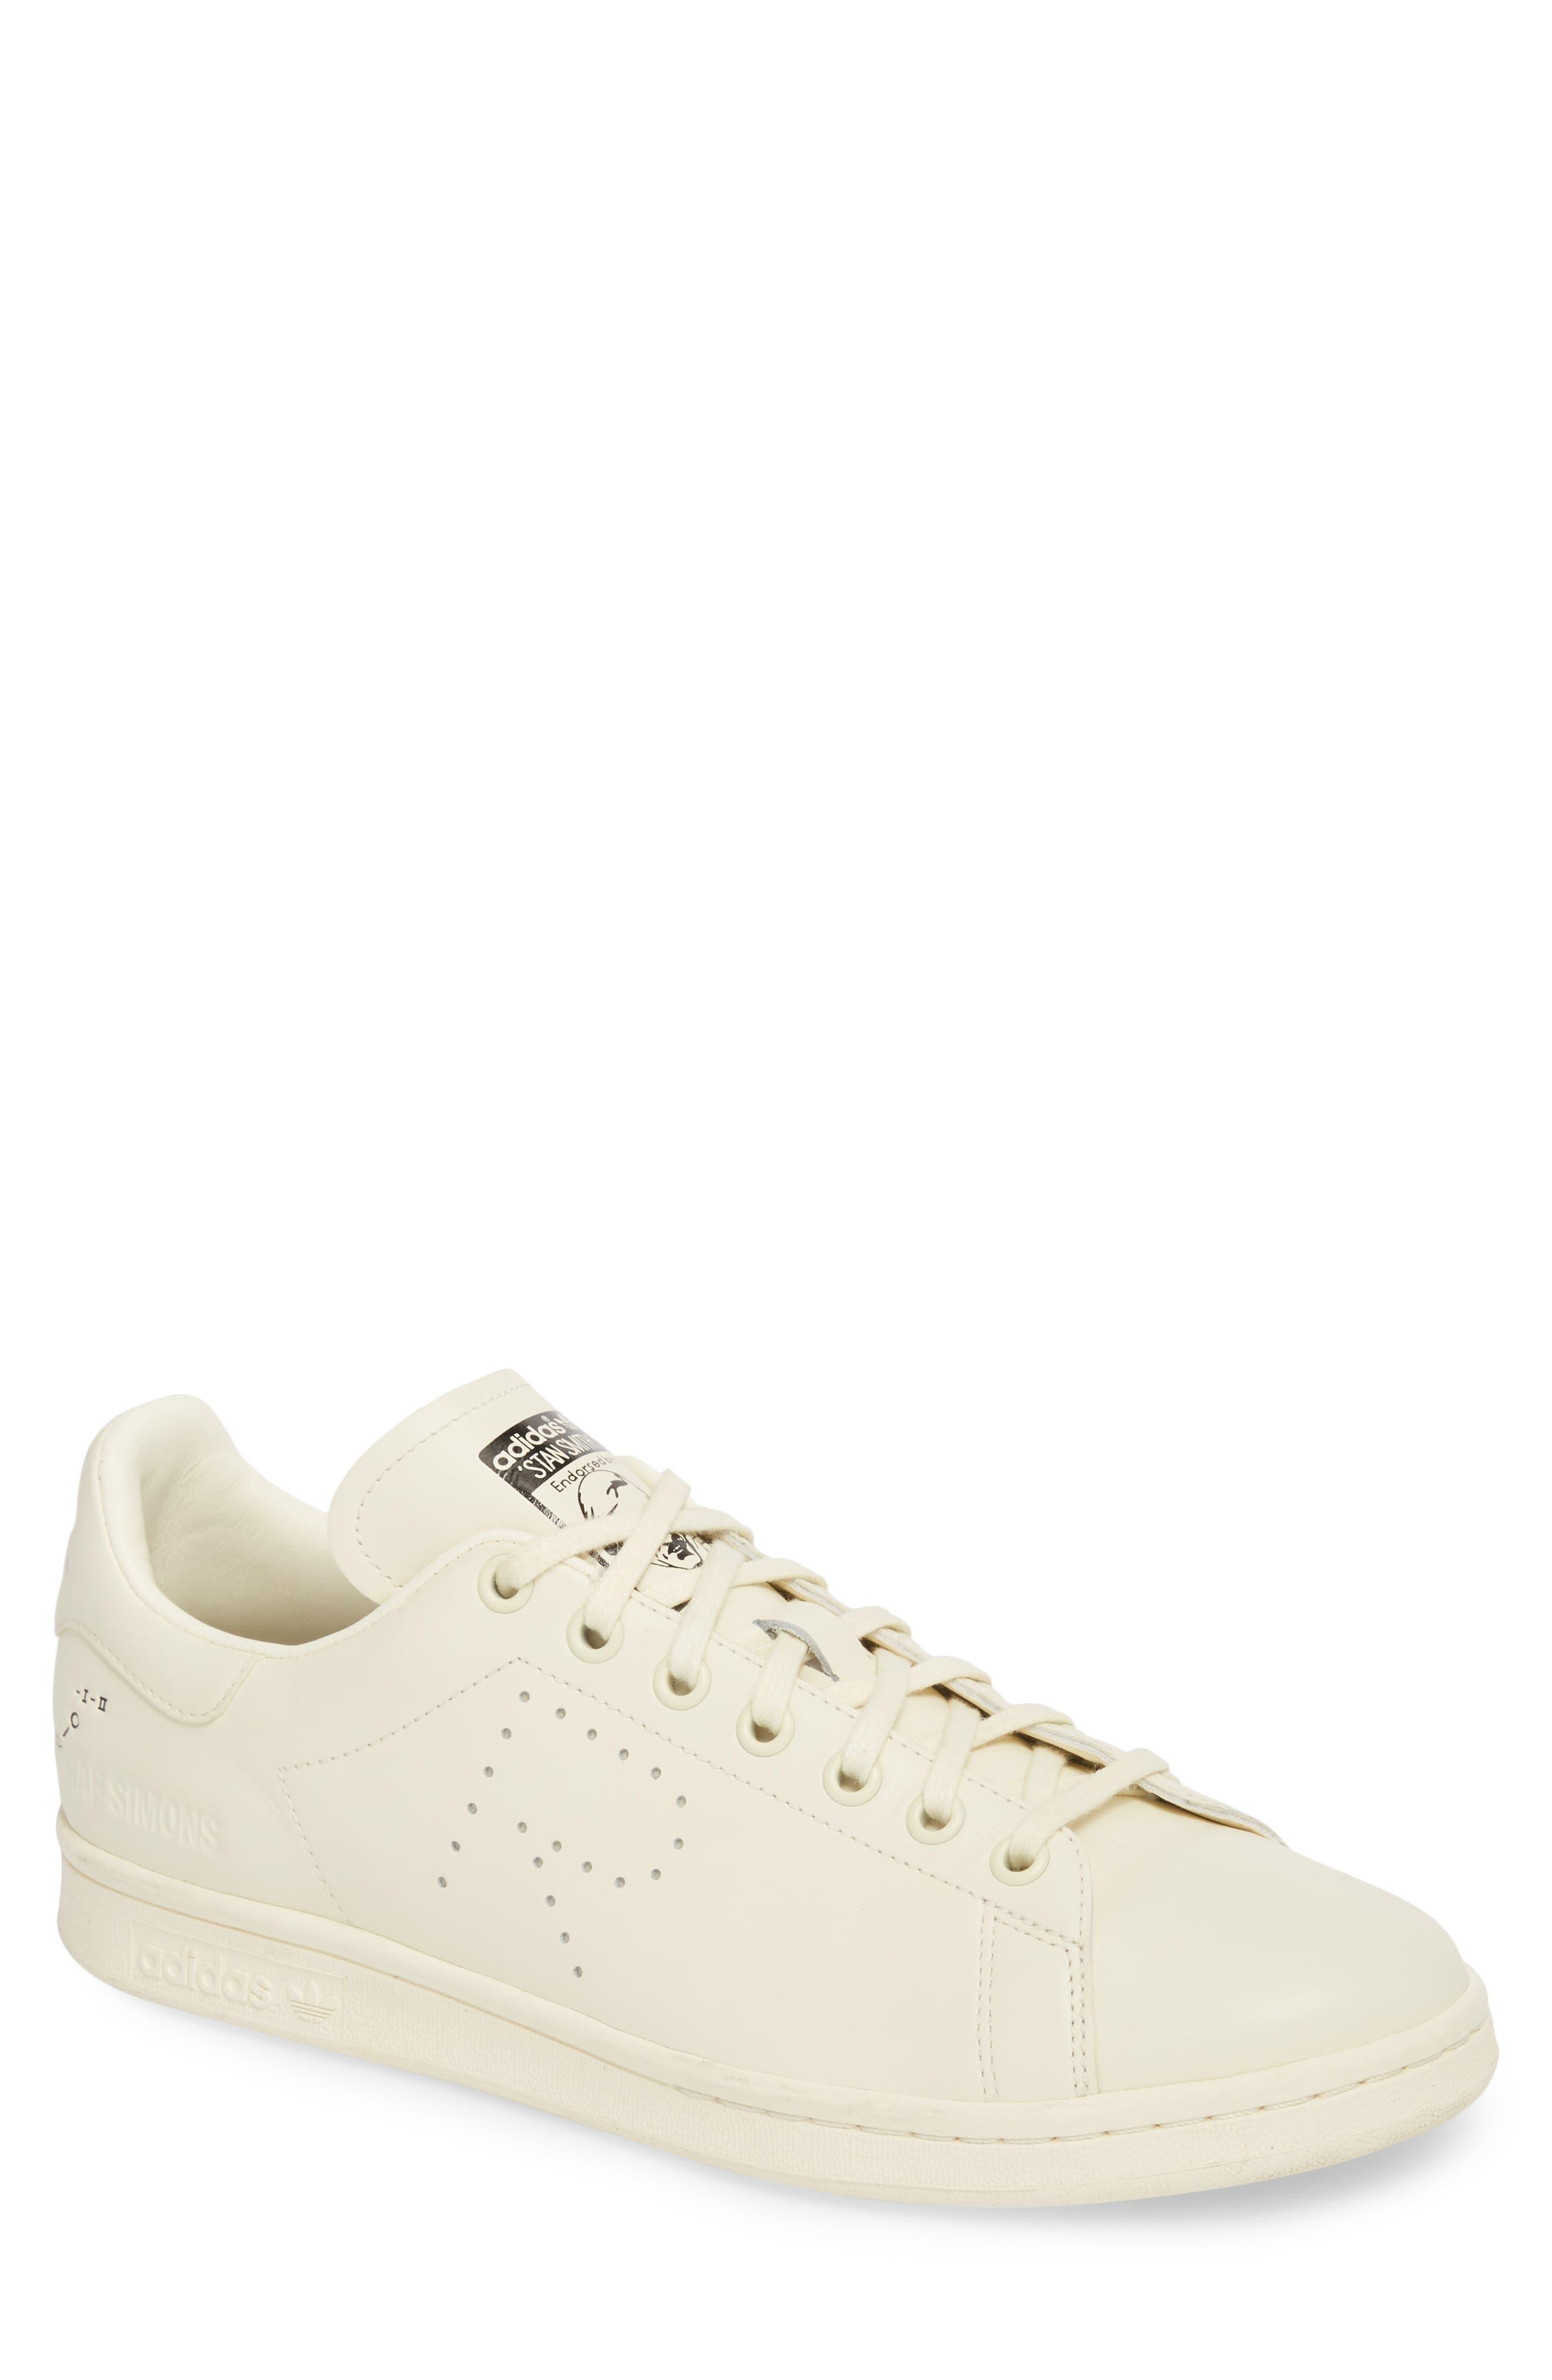 sale adidas stan smith sneakers a9b1c 2f4eb